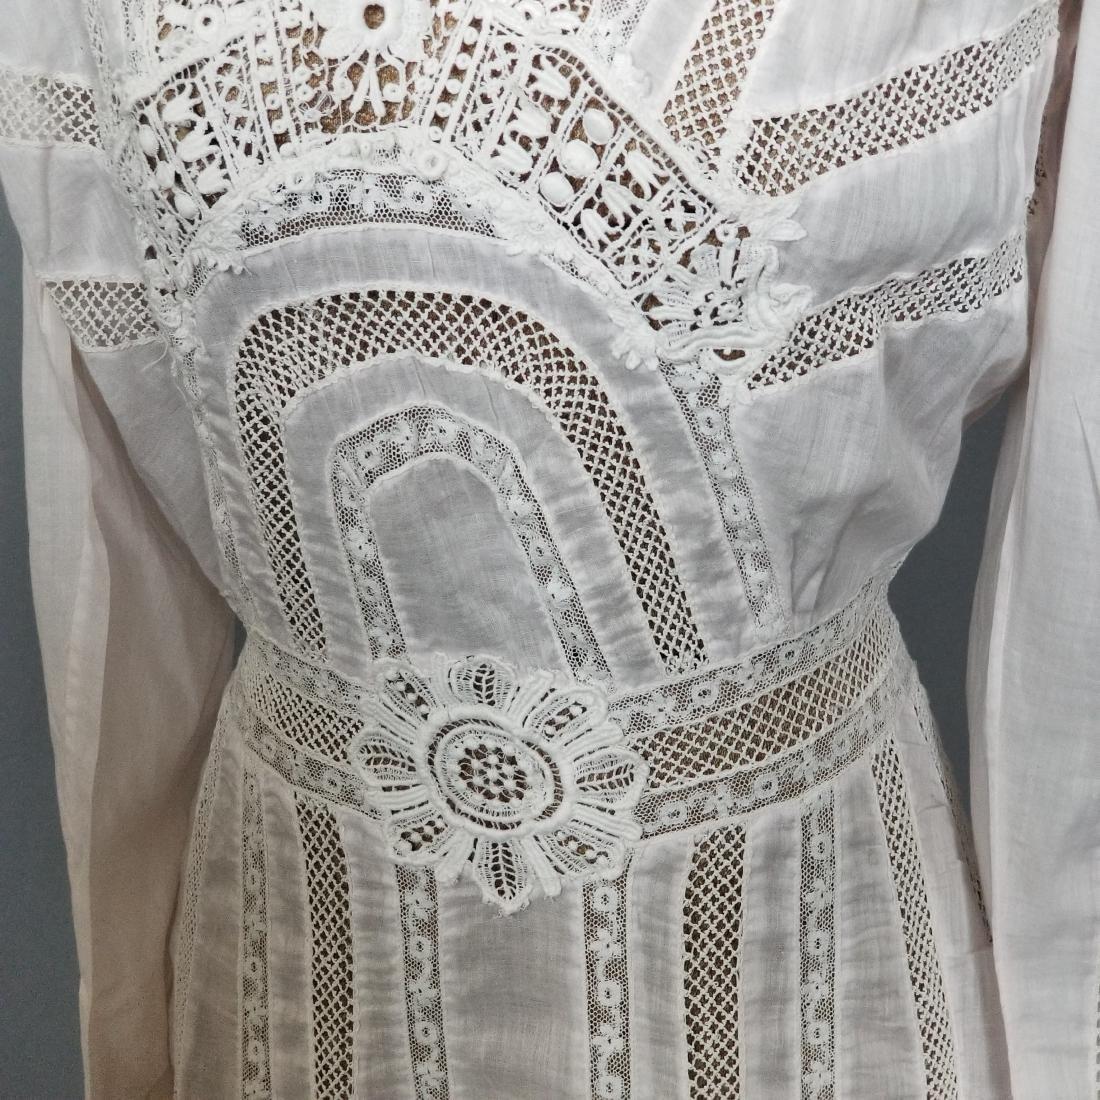 Pale Pink Lingerie Dress - 3